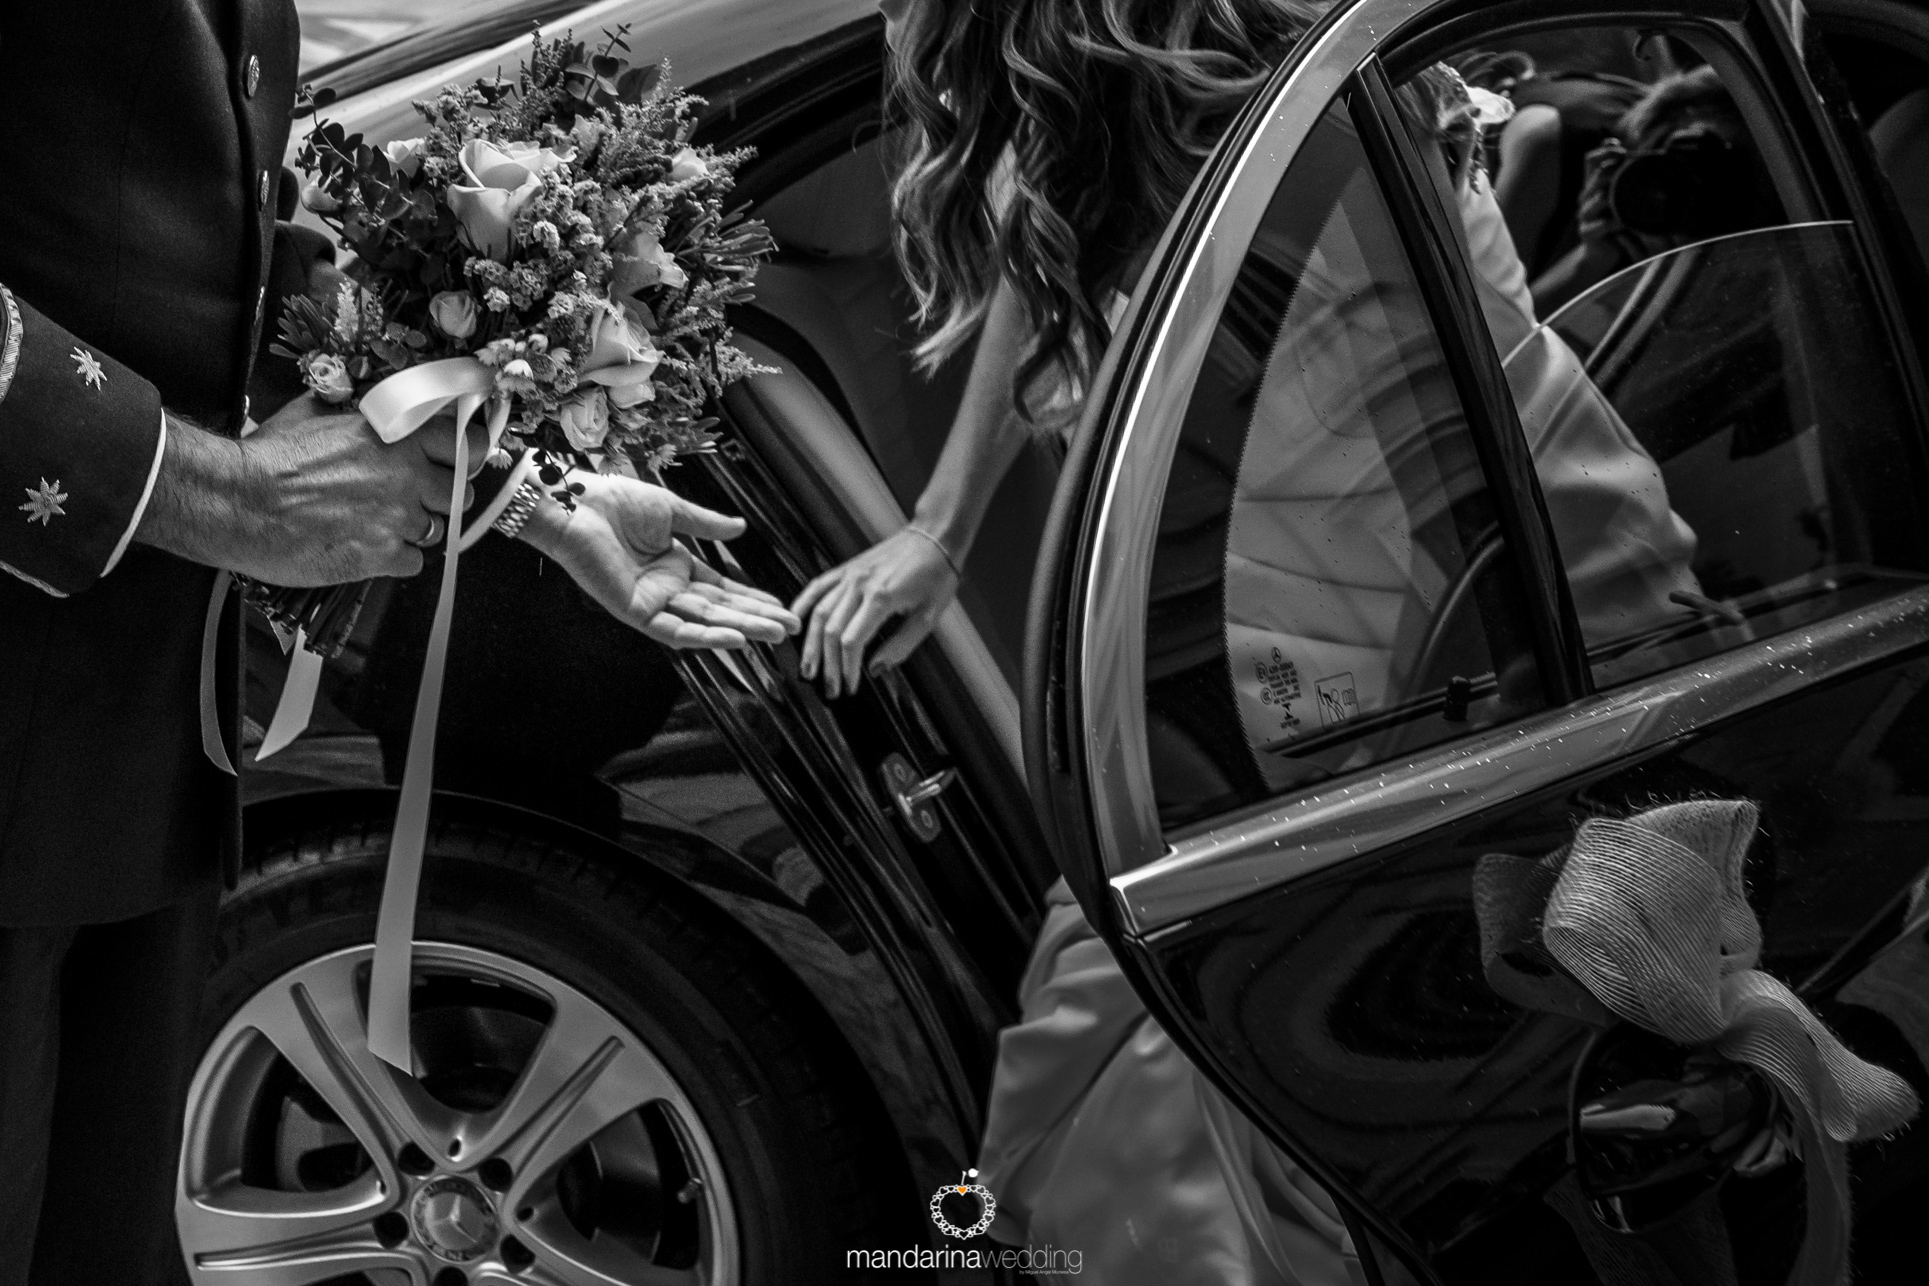 mandarina wedding, fotografo boda pais vasco, fotografo boda zaragoza, fotógrafo boda soria, fotografo boda Madrid, fotógrafo boda tarragona-02